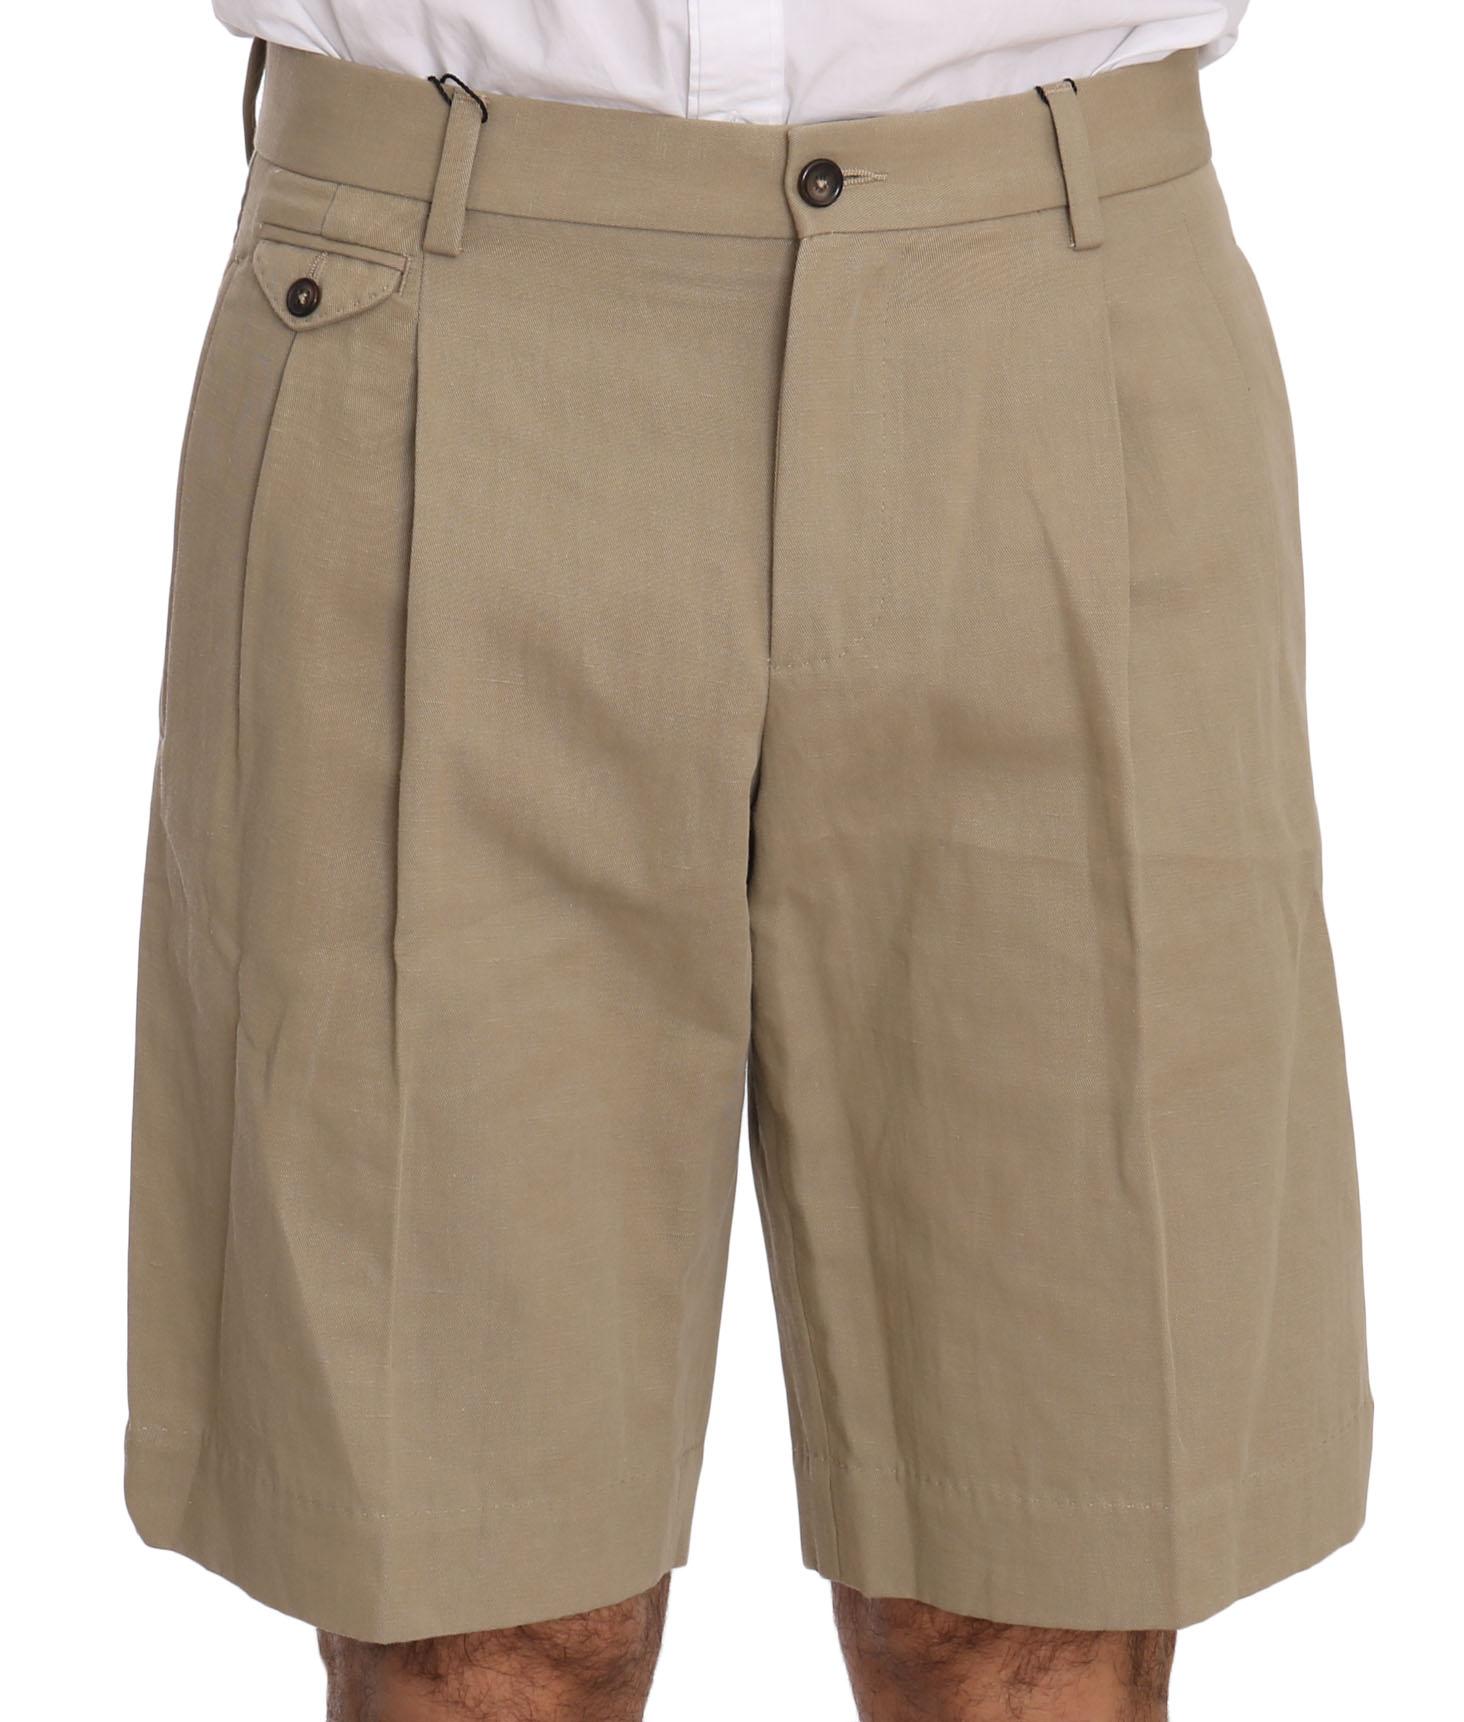 Dolce & Gabbana Men's Royal Bee Shorts Beige PAN70334 PAN70334 - IT44 | S